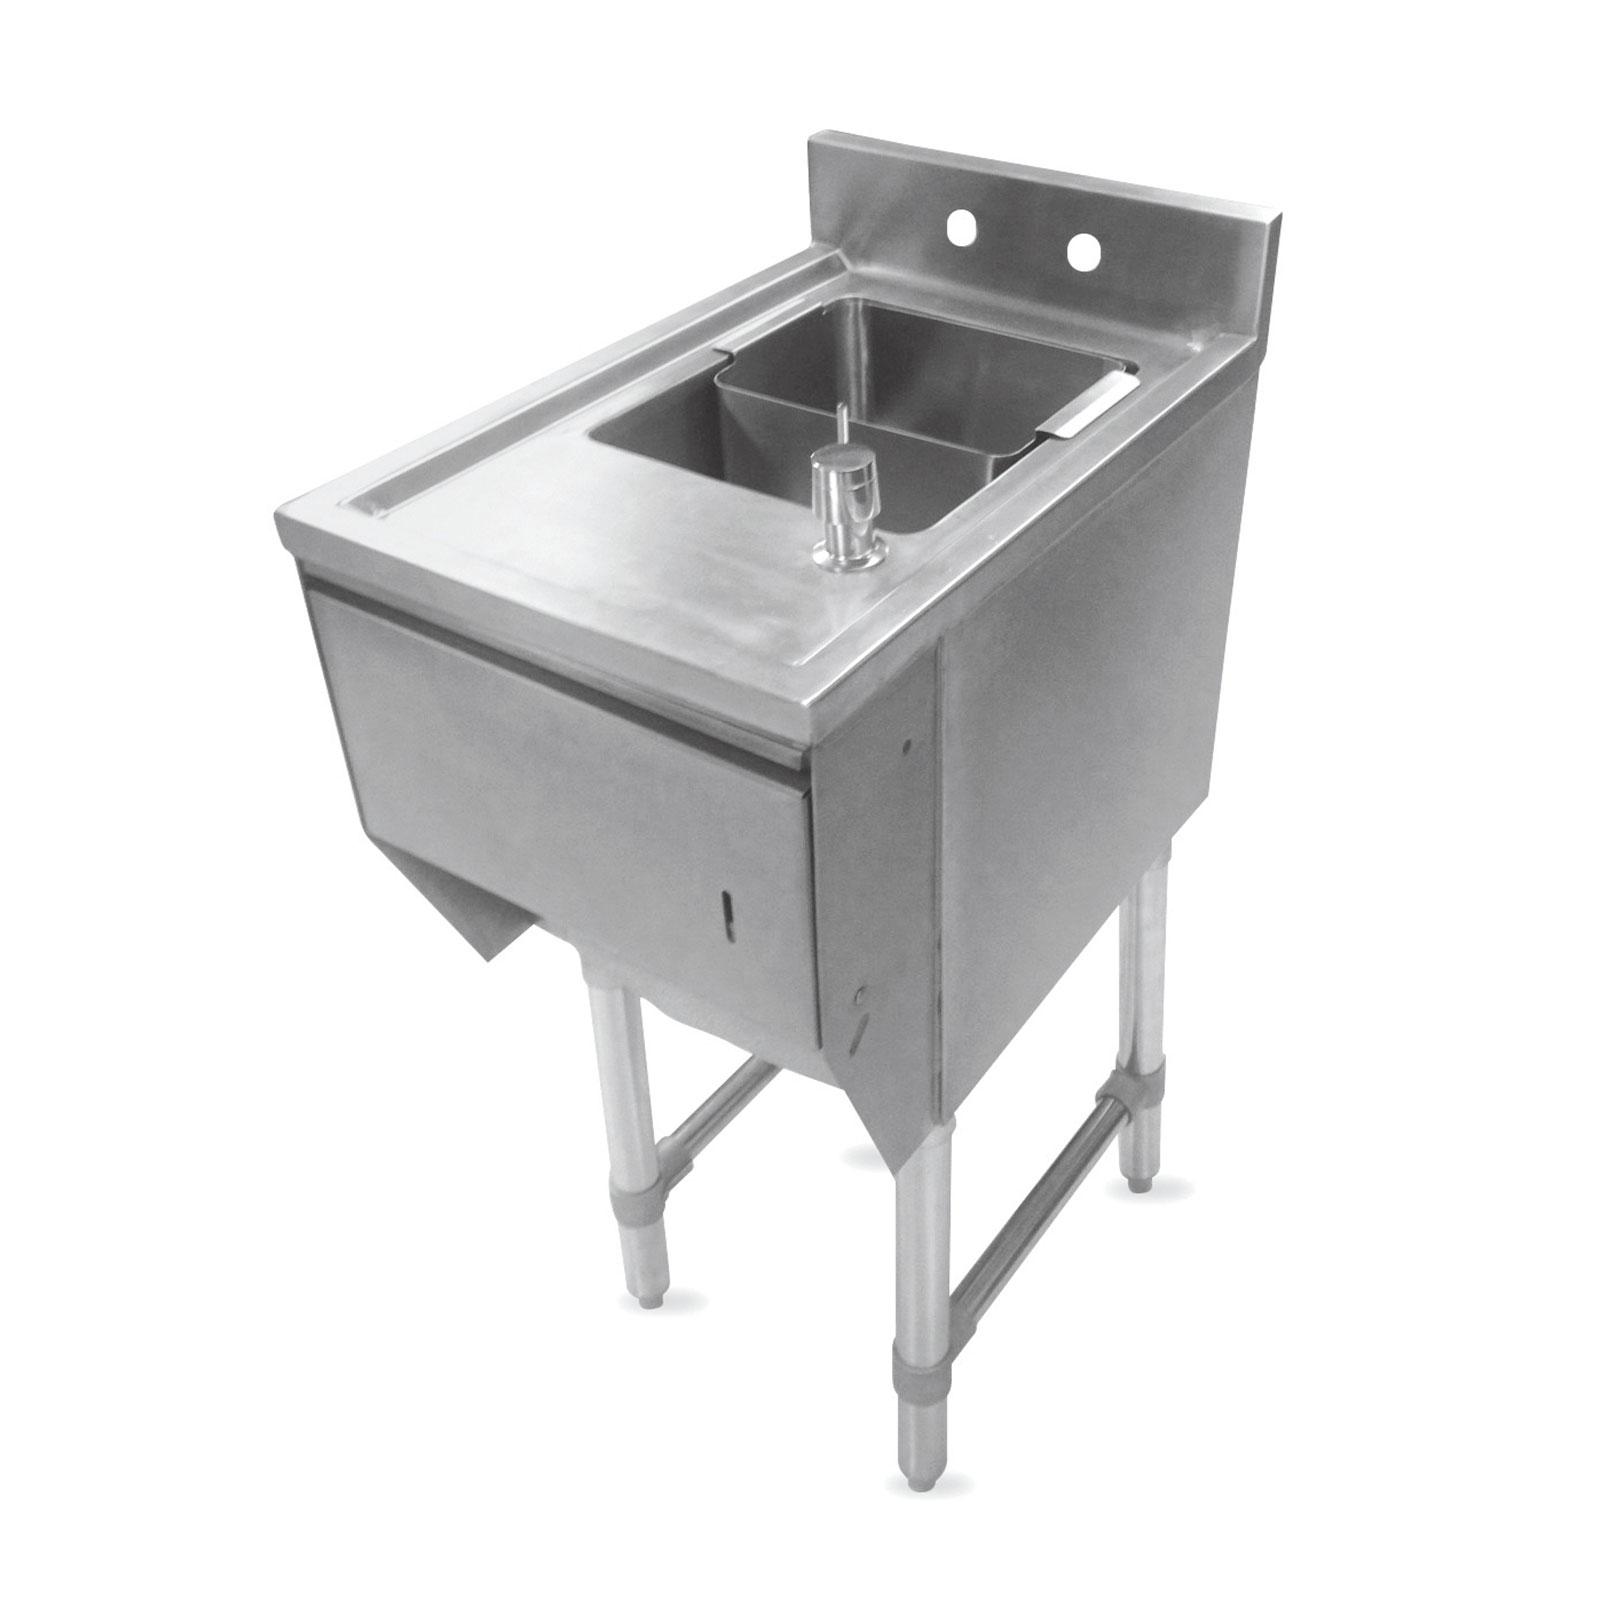 John Boos EUBDS-1218STD underbar sink units